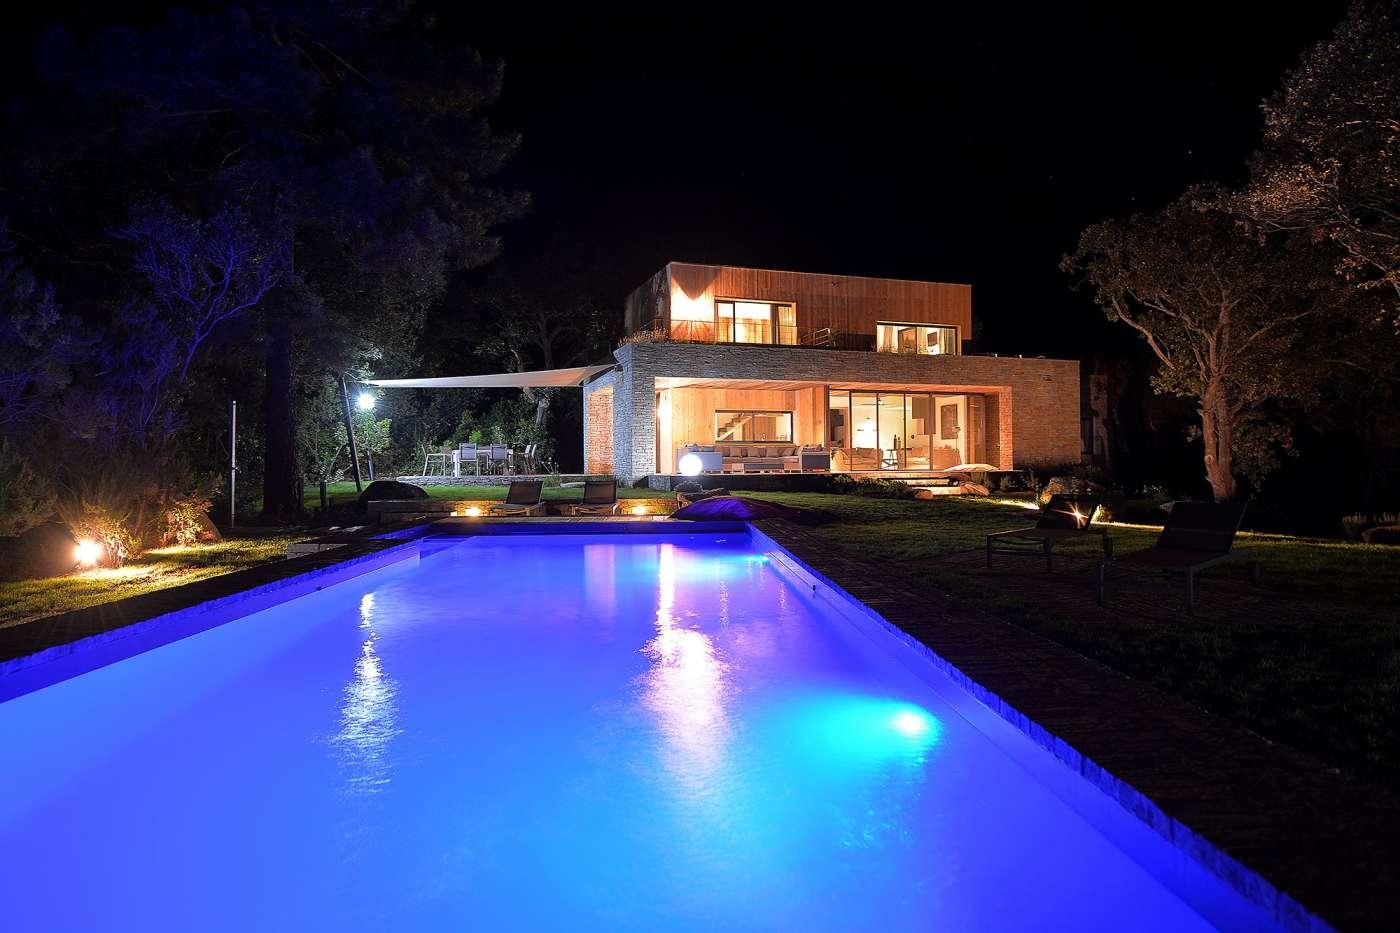 _les_lofts_de_palombaggia_residence_11220140724115116_1400xautox60